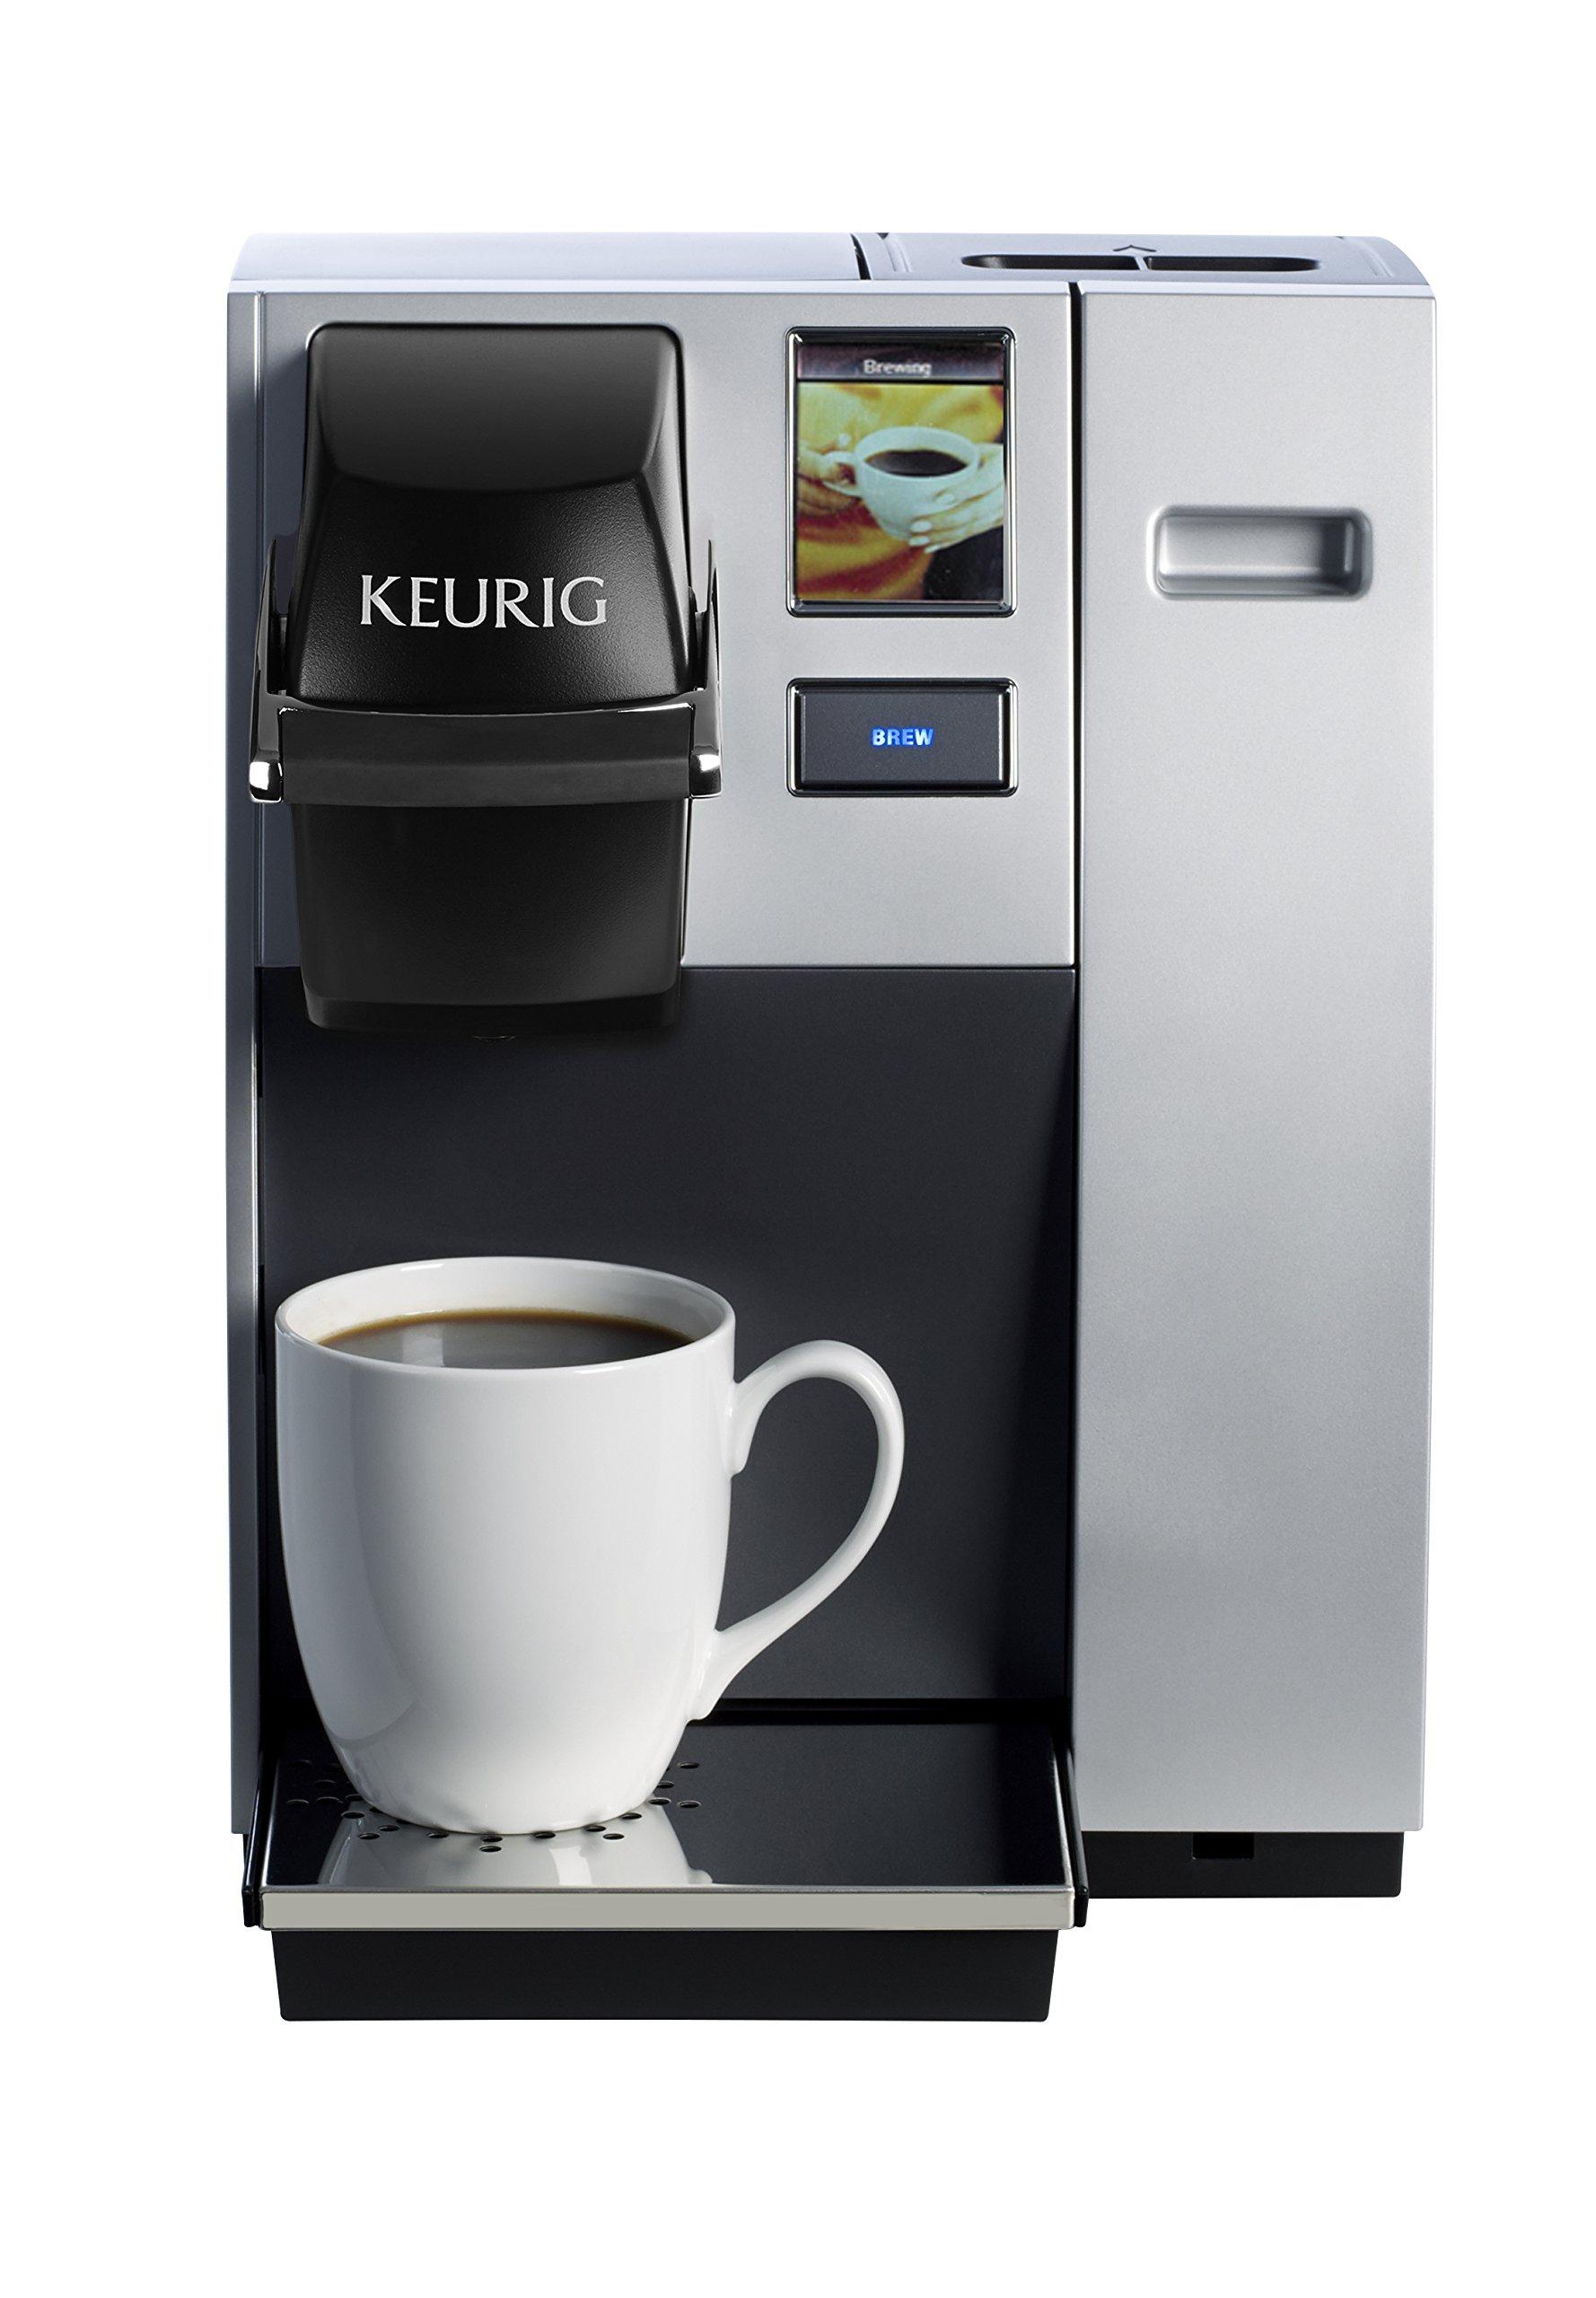 Keurig K150 Single Cup Commercial Coffee Maker, Single Serve K-Cup Pod Coffee Brewer, Silver by Keurig